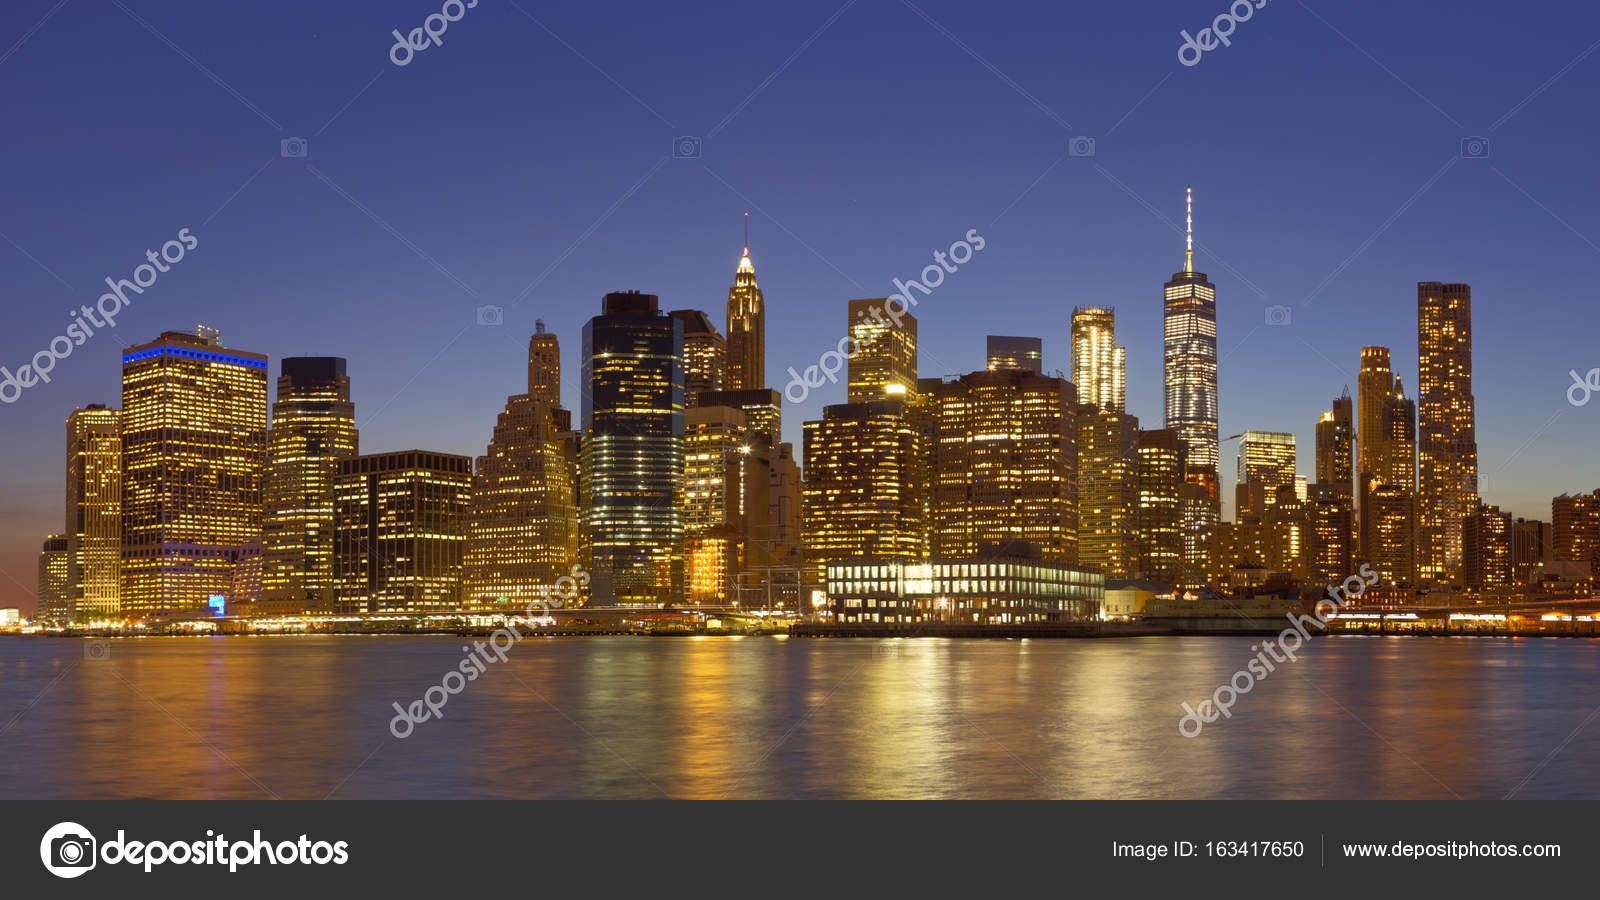 Nyc Skyline At Night Wallpaper The New York City Skyline At Night Stock Photo C Sara Winter 163417650